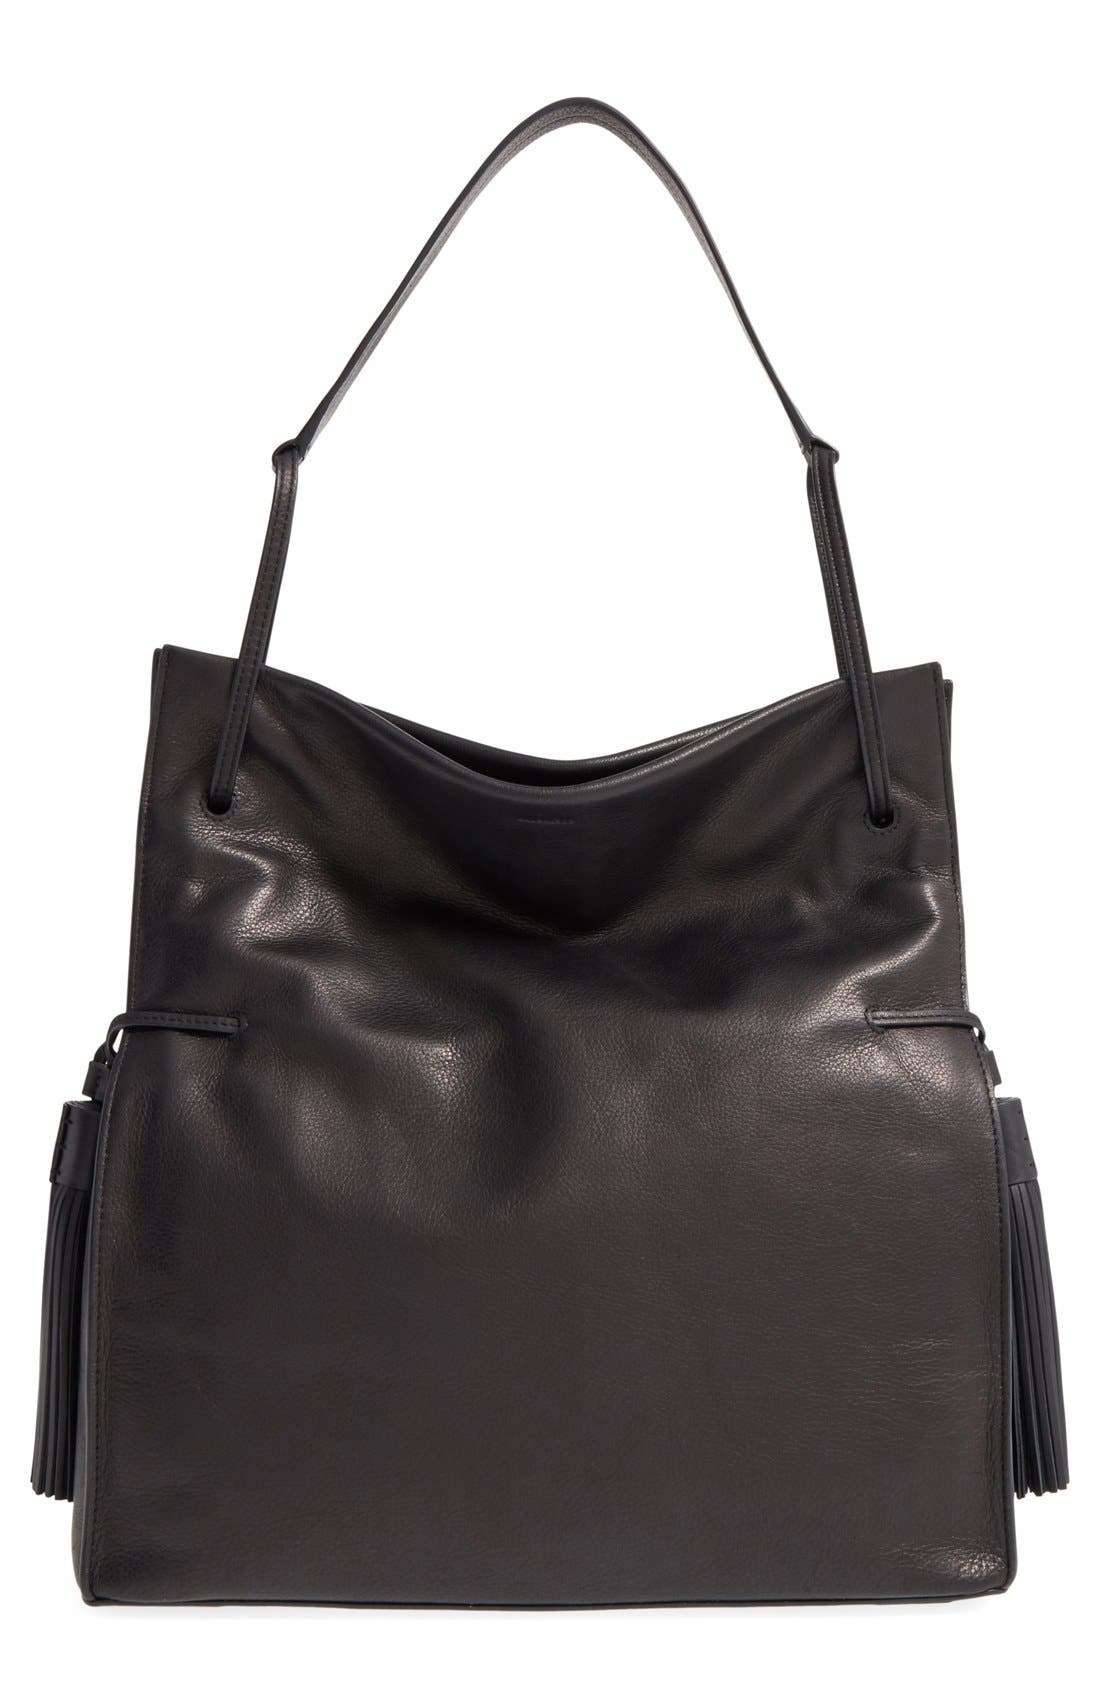 Main Image - ALLSAINTS 'Freedom' Tassel Leather Hobo